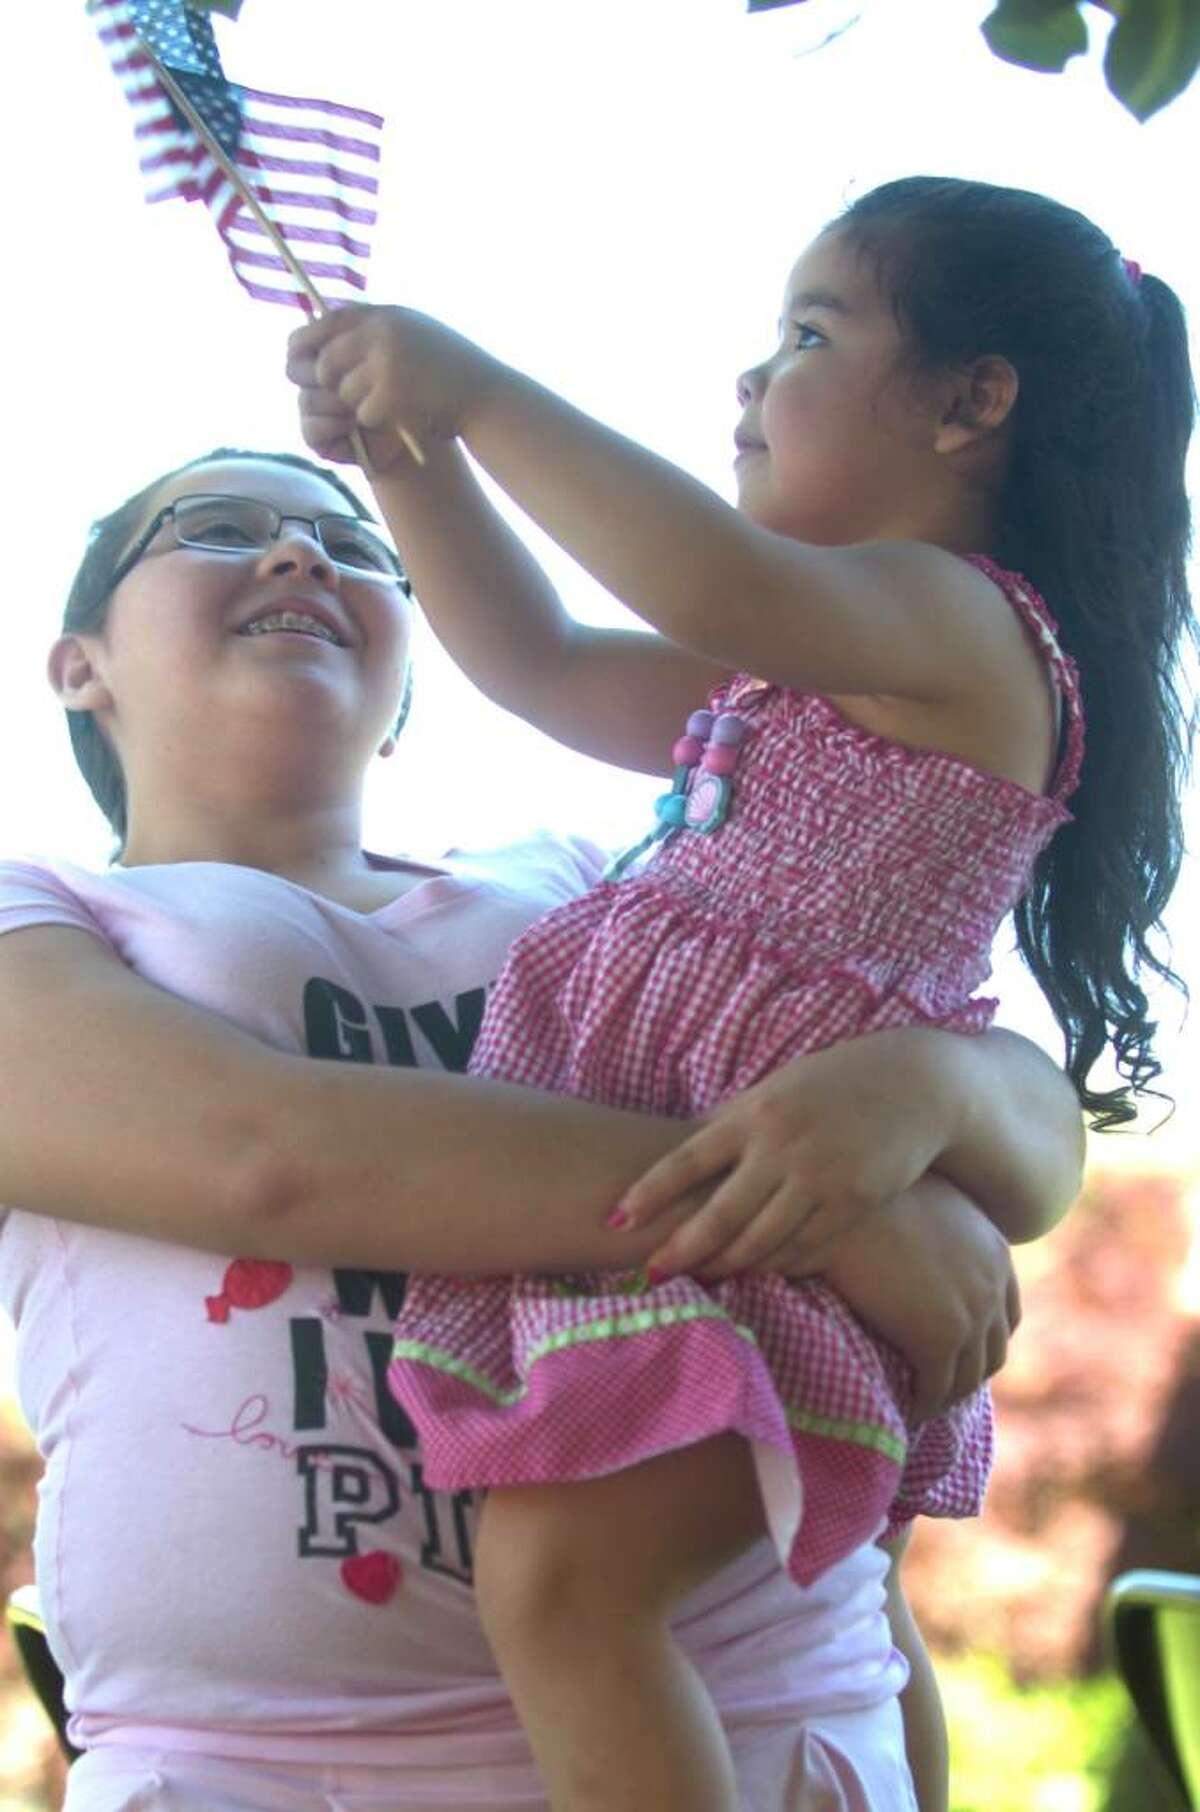 Fernenda Moreno, 12, carries her sister Camila, 3, at the Bryam parade on Sunday, May 30, 2010.